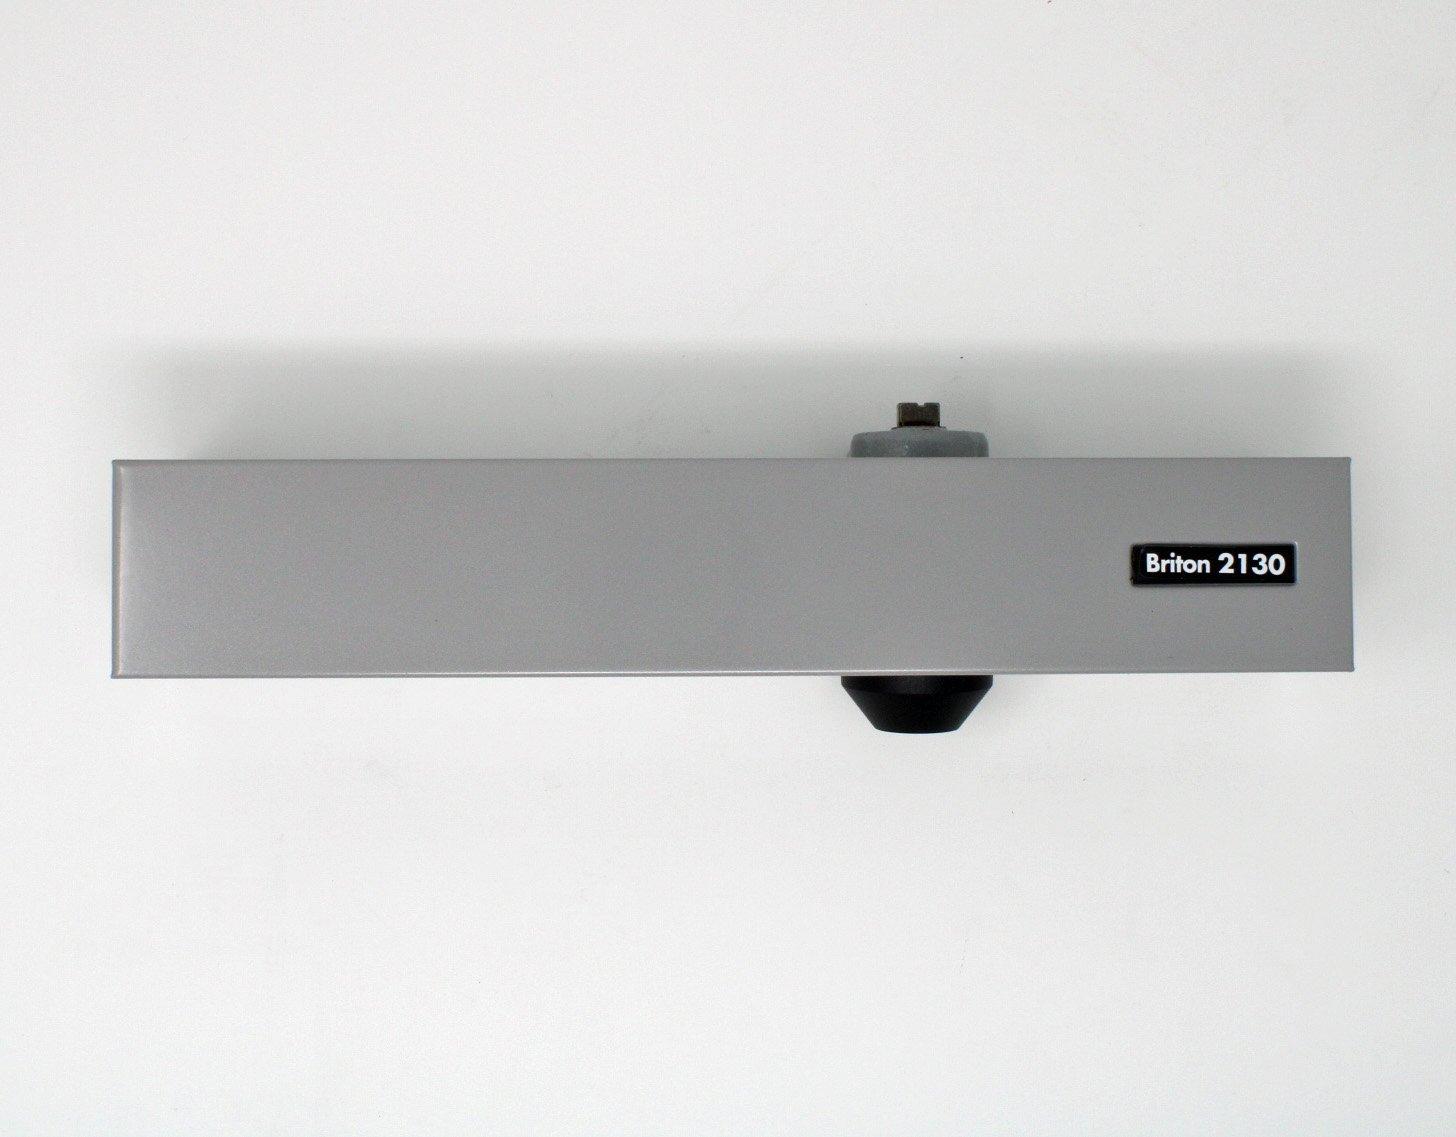 Briton 2130B Size 2-6 Overhead Door Closer With Backcheck